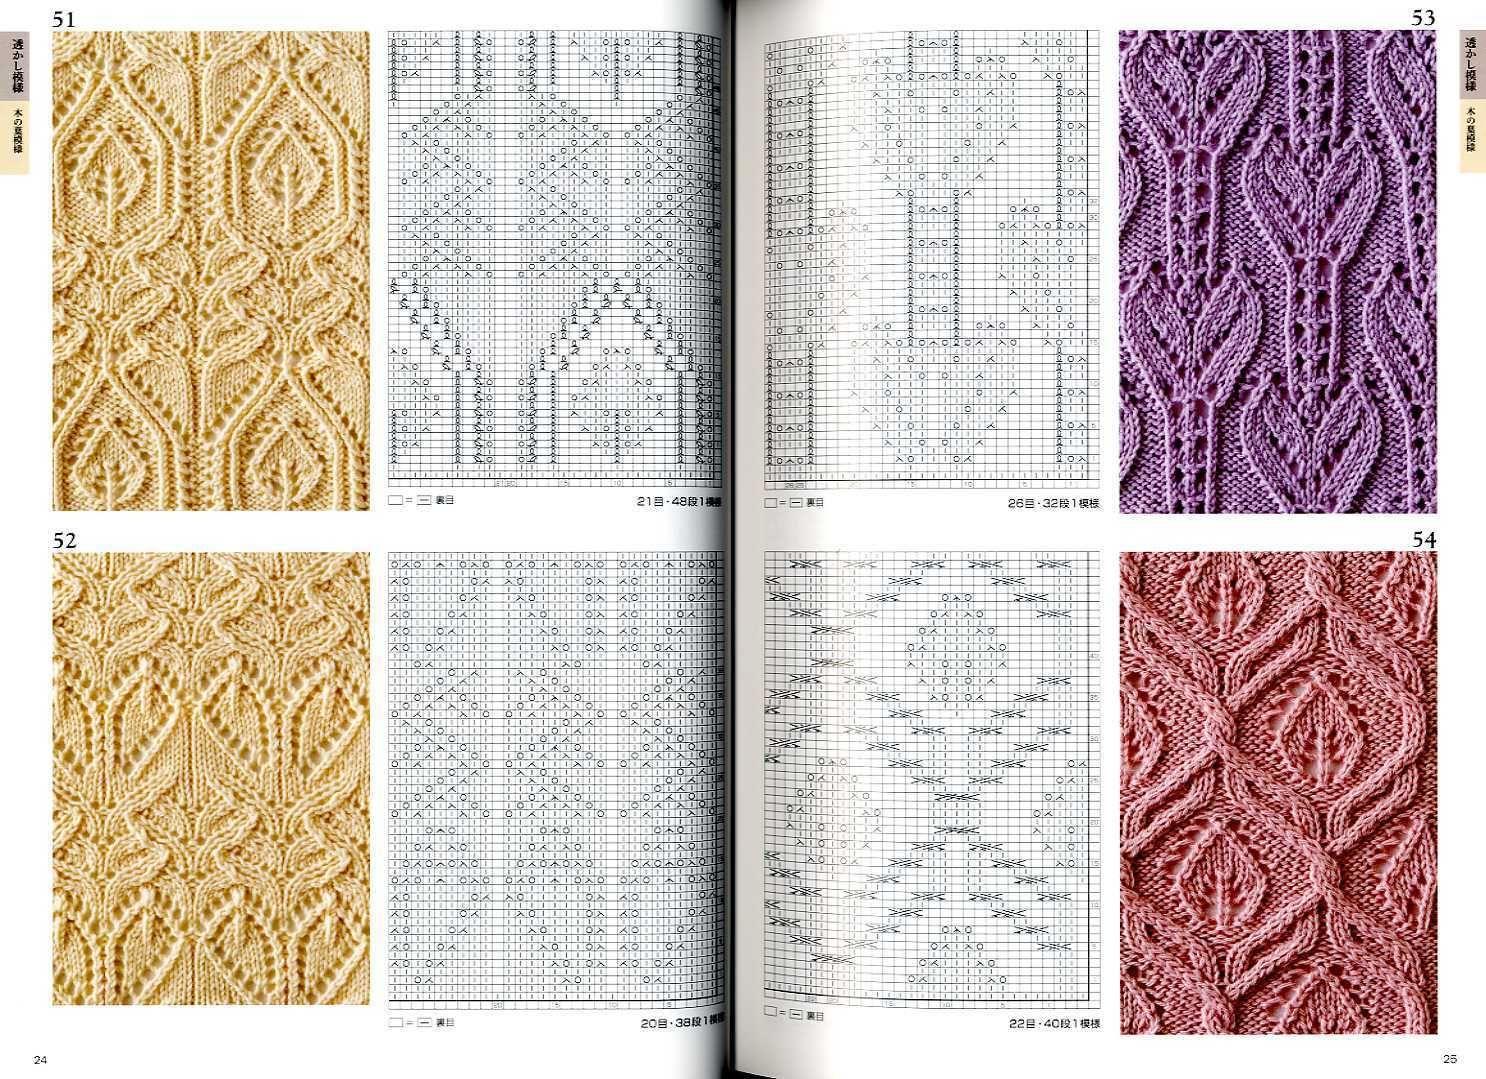 Knitting Pattern Book 260 by Hitomi Shida - Japanese Craft Book SP11 ...